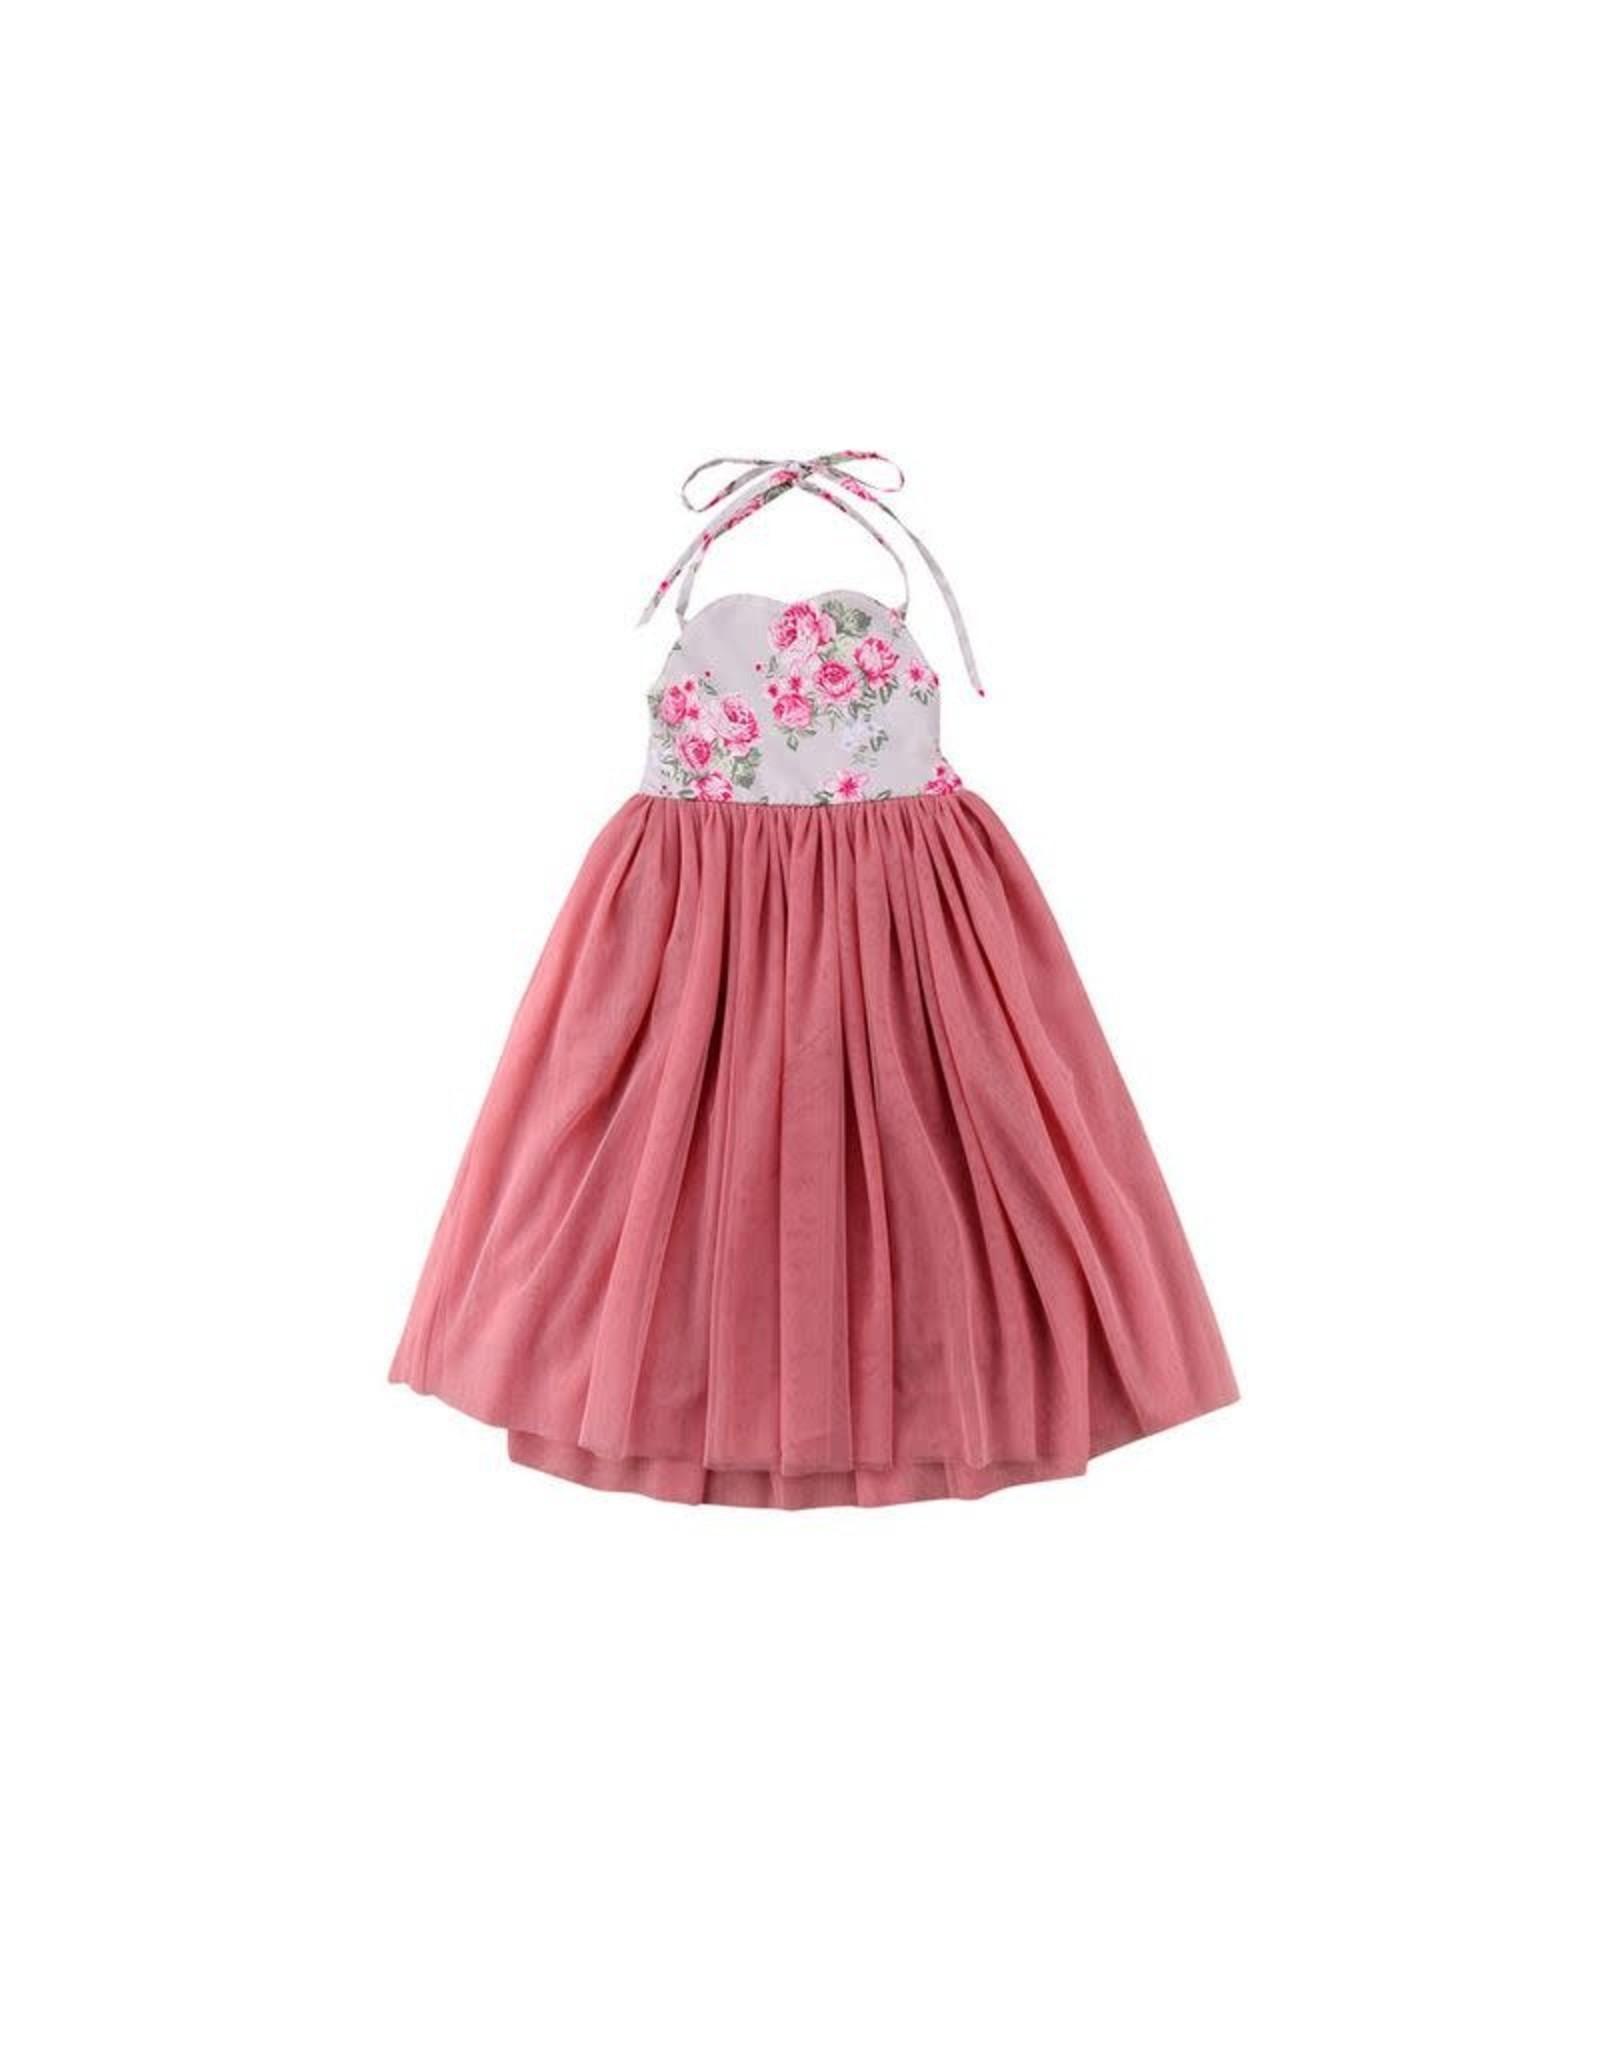 loved by Jade Presley loved by jade presley- Floral Halter Mauve Tulle Dress